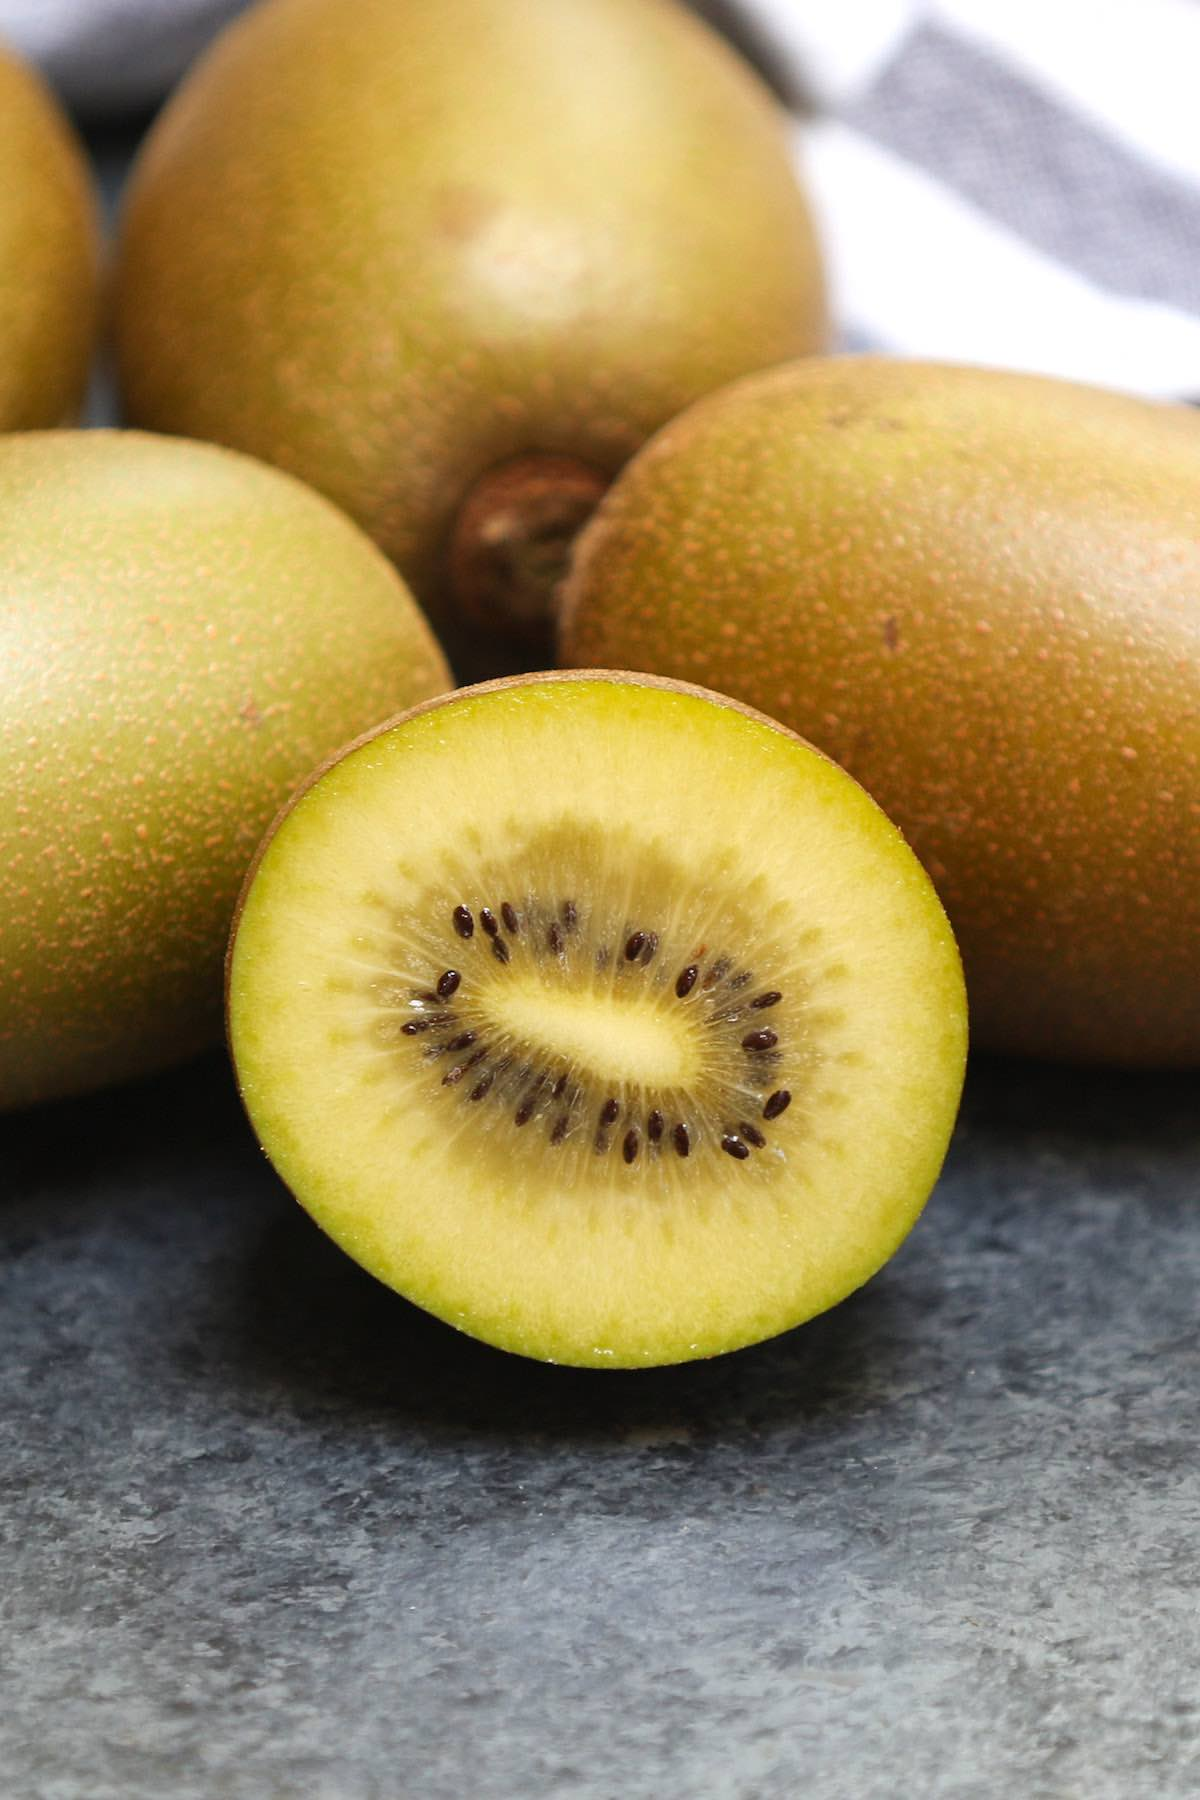 Closeup of a golden kiwi cut in half